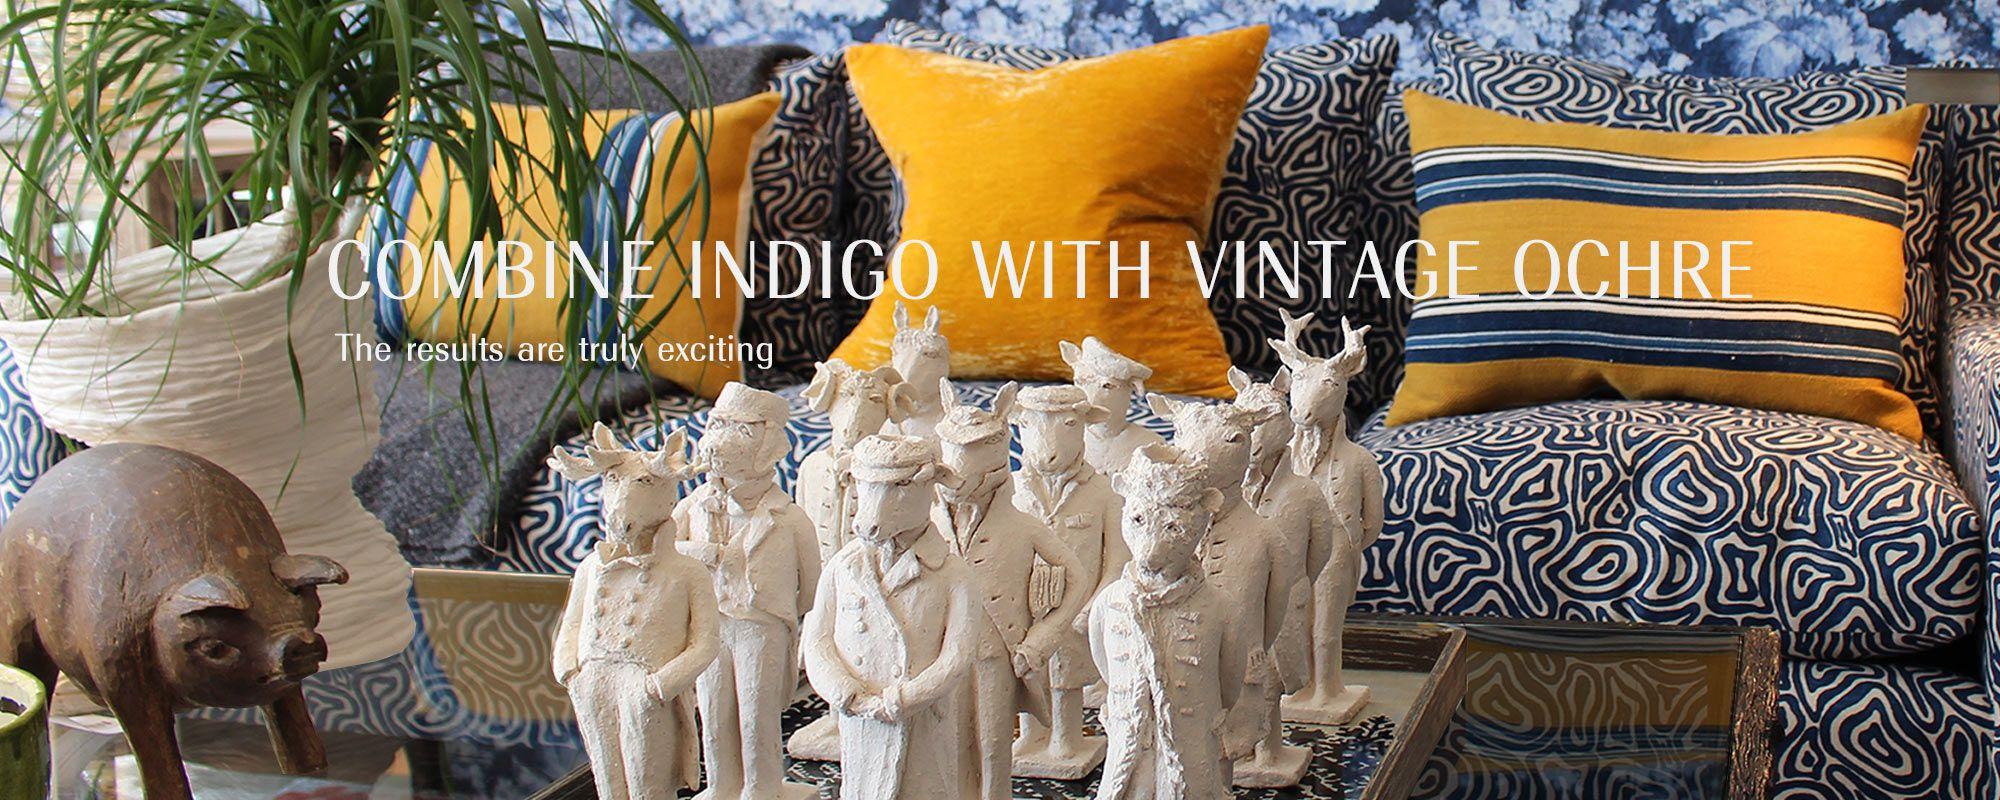 Combine Indigo with Vintage Ochre